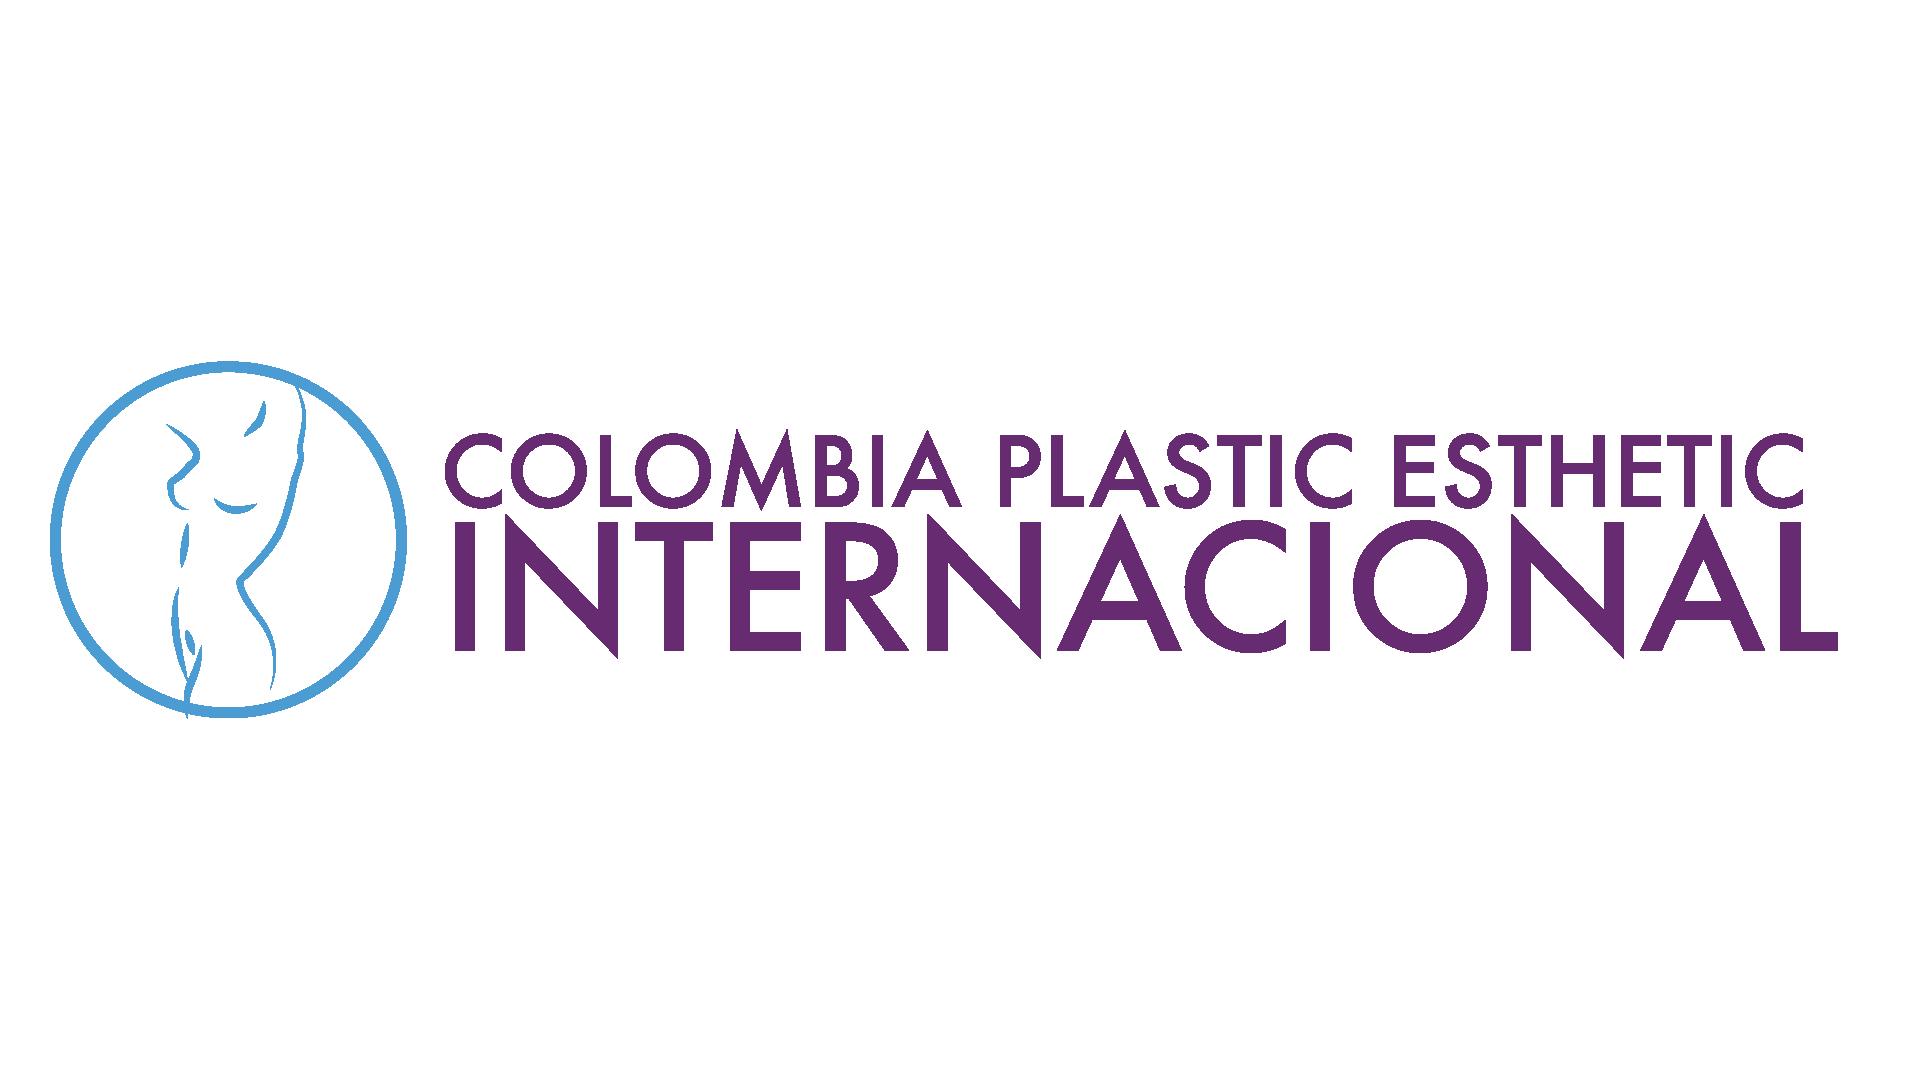 LOGO COLOMBIA PLASTIC ESTHETIC INTERNATIONAL